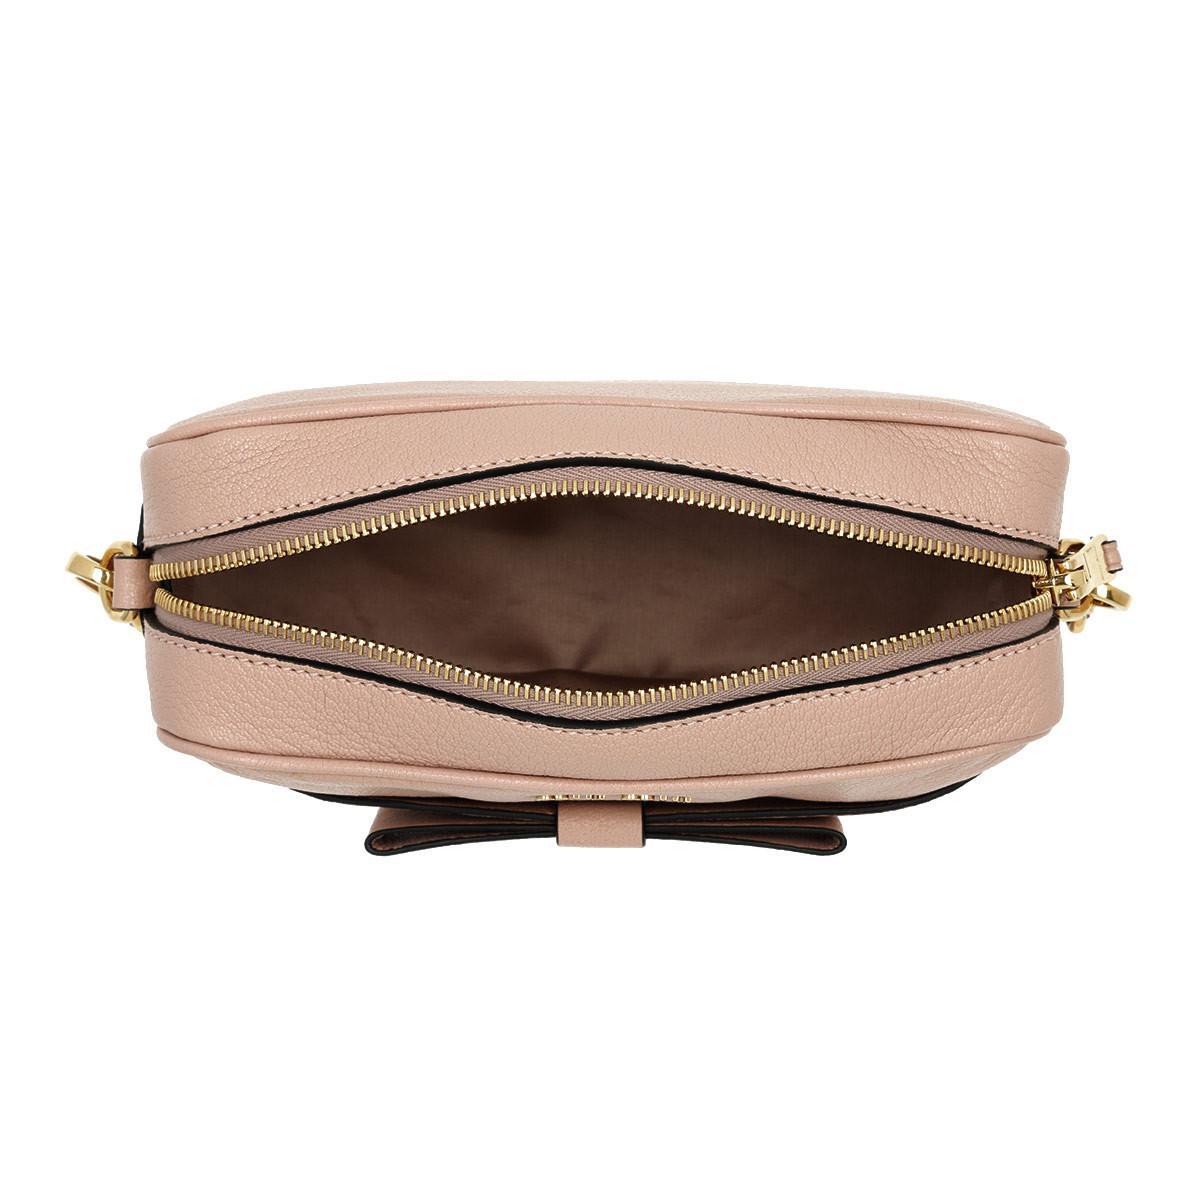 124e23cb3a682 Gallery. Previously sold at: Fashionette · Women's Miu Miu Crossbody  Women's Miu Miu Shoulder Bag